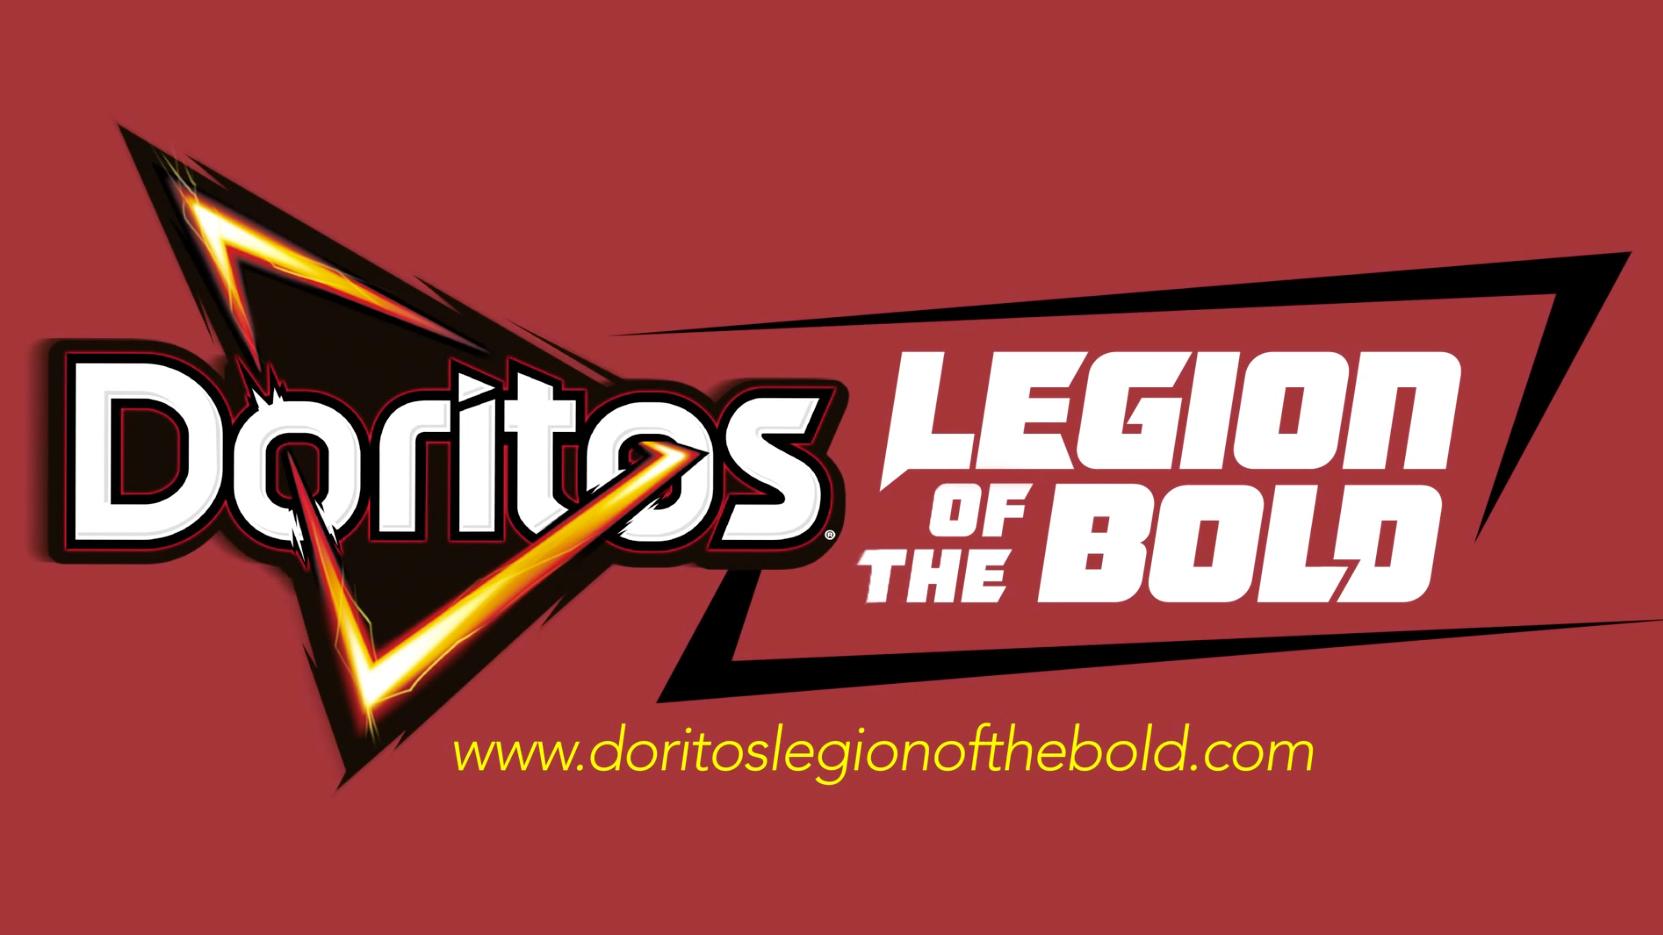 Doritos Legion of the Bold